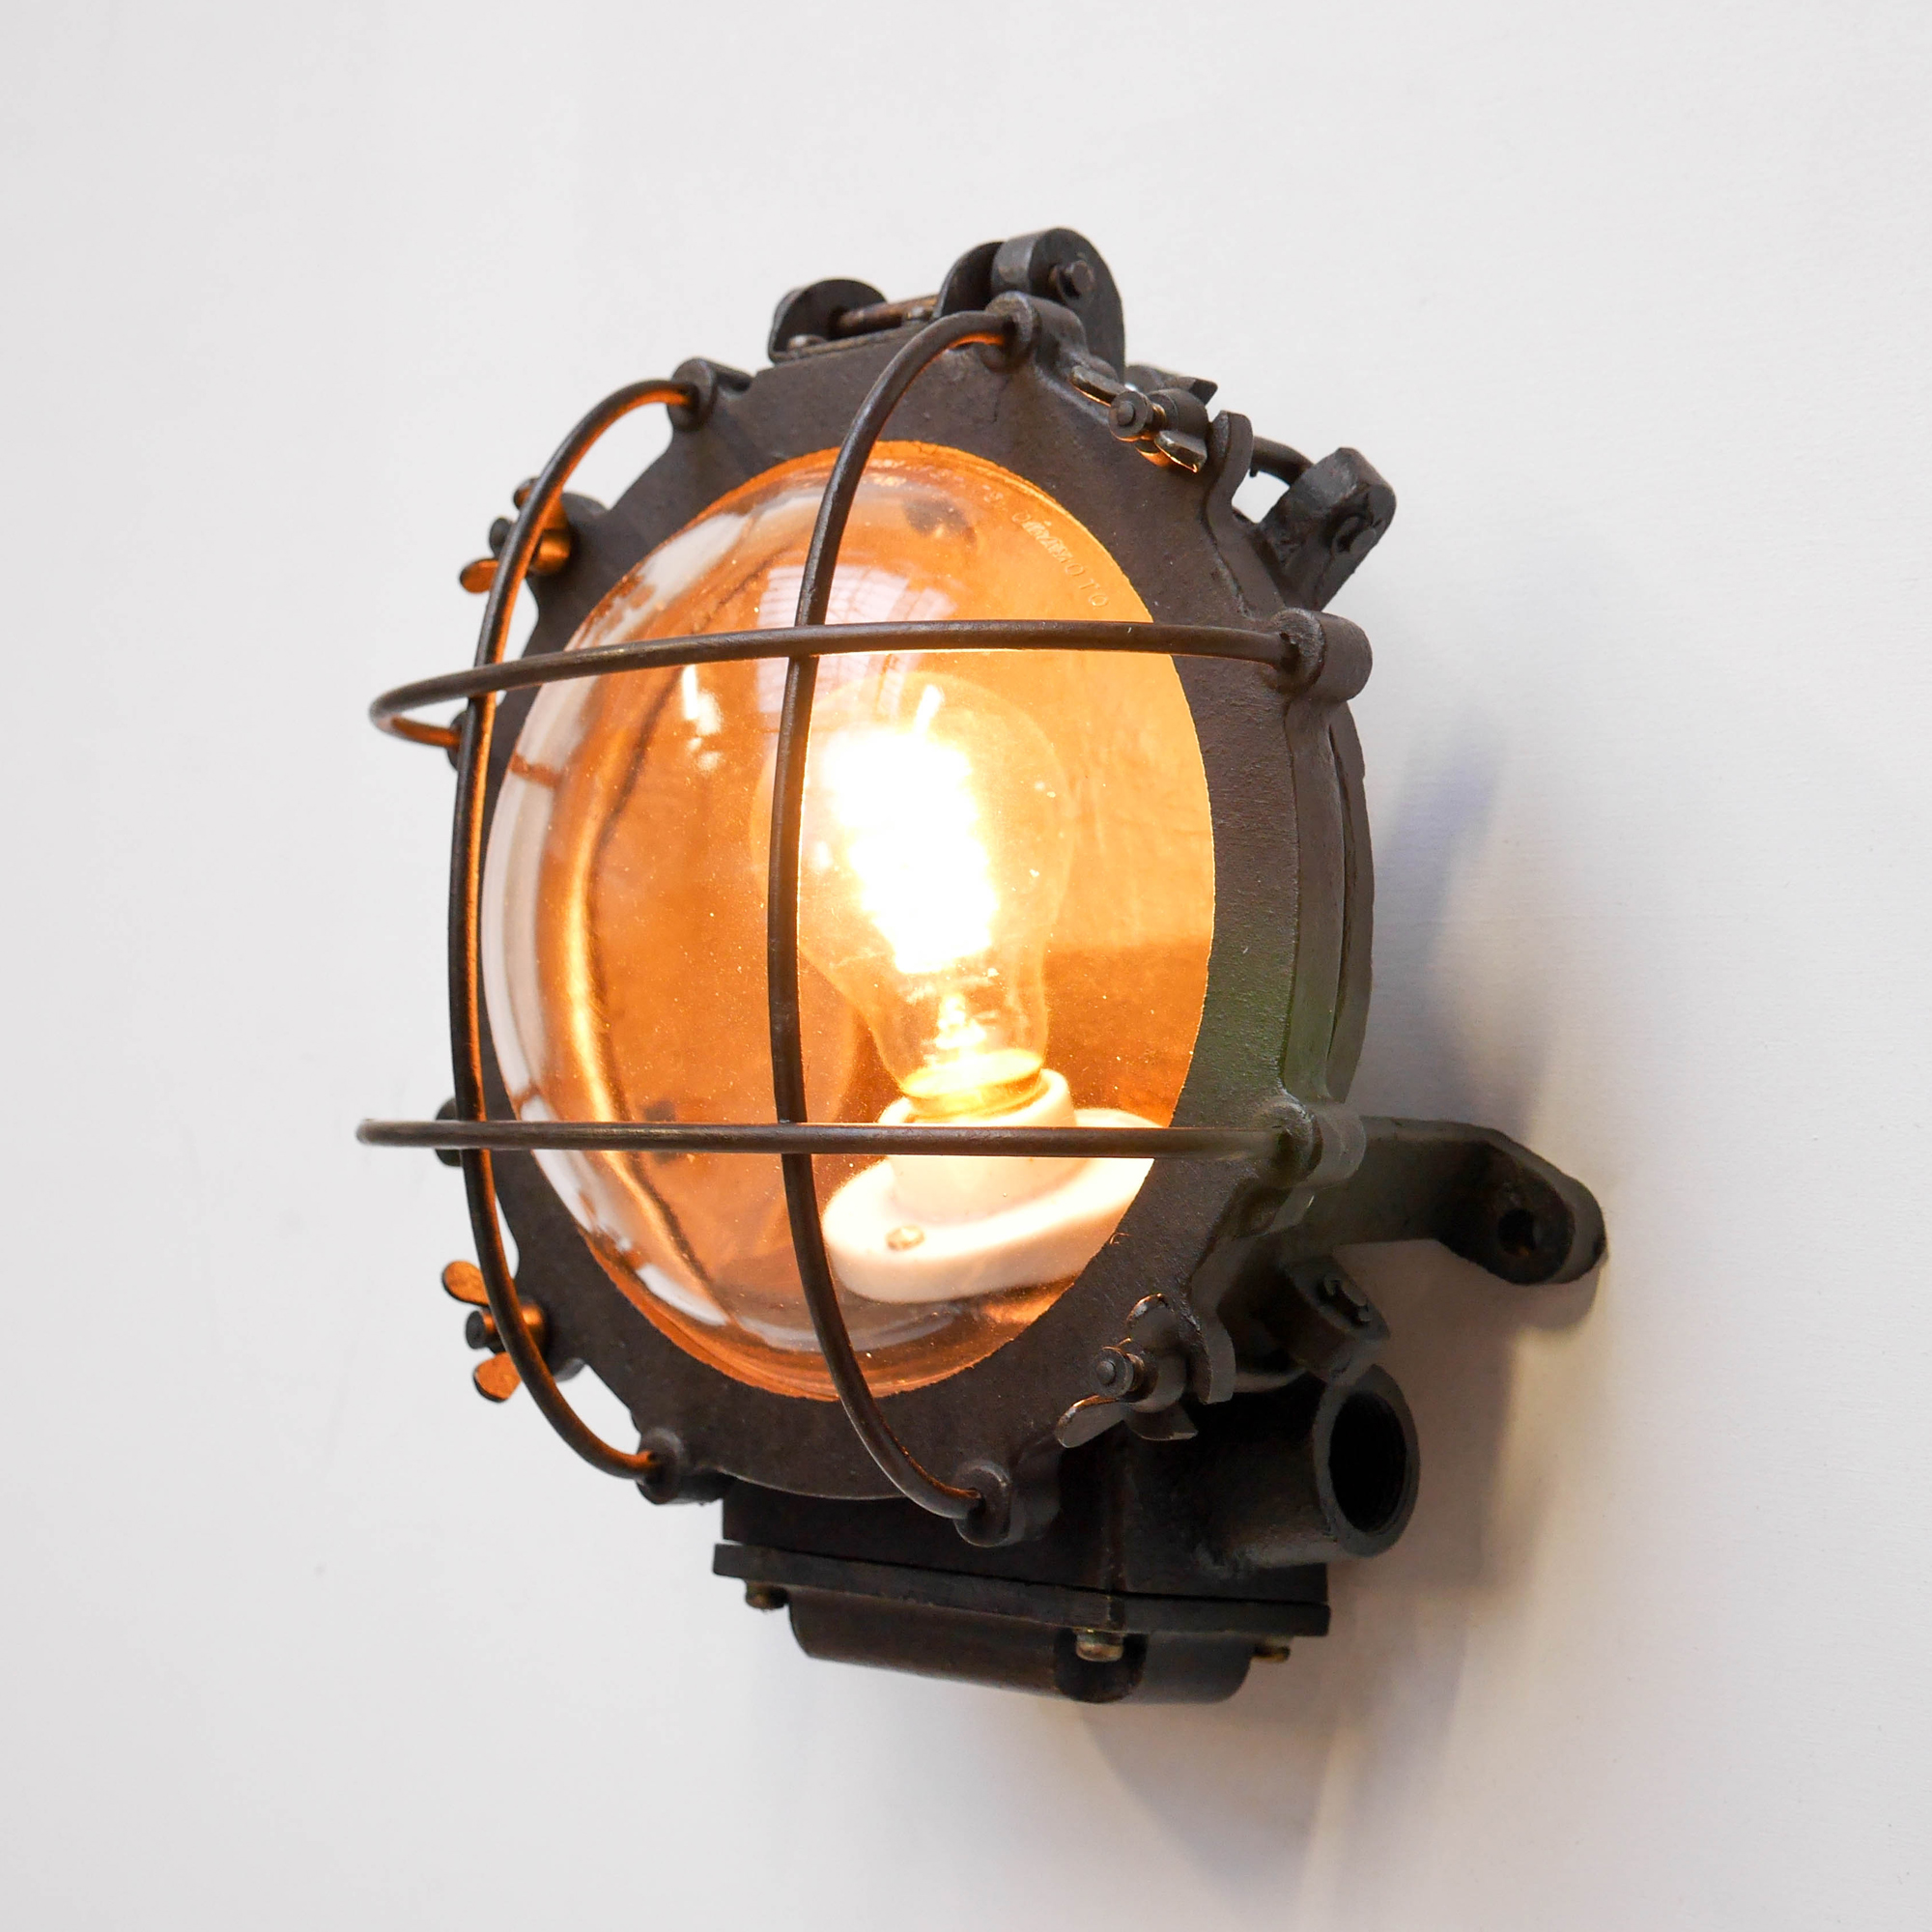 applique ronde grillag e fonte d 39 acier patin e. Black Bedroom Furniture Sets. Home Design Ideas